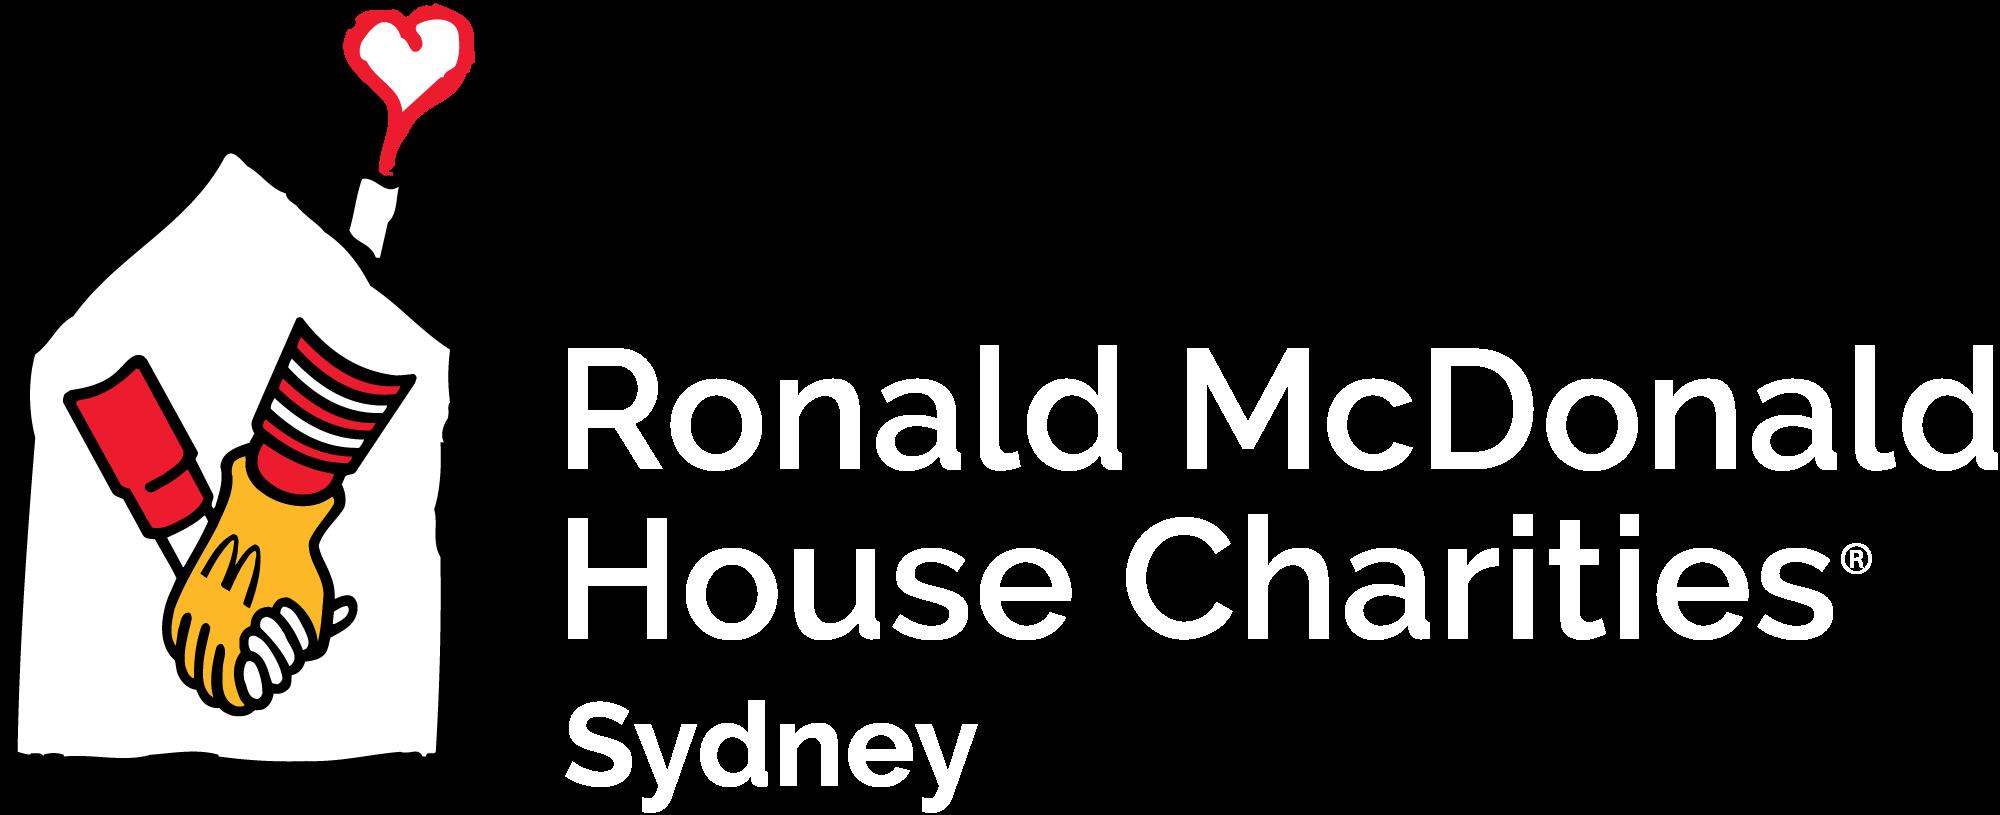 Ronald McDonald House Charities Sydney